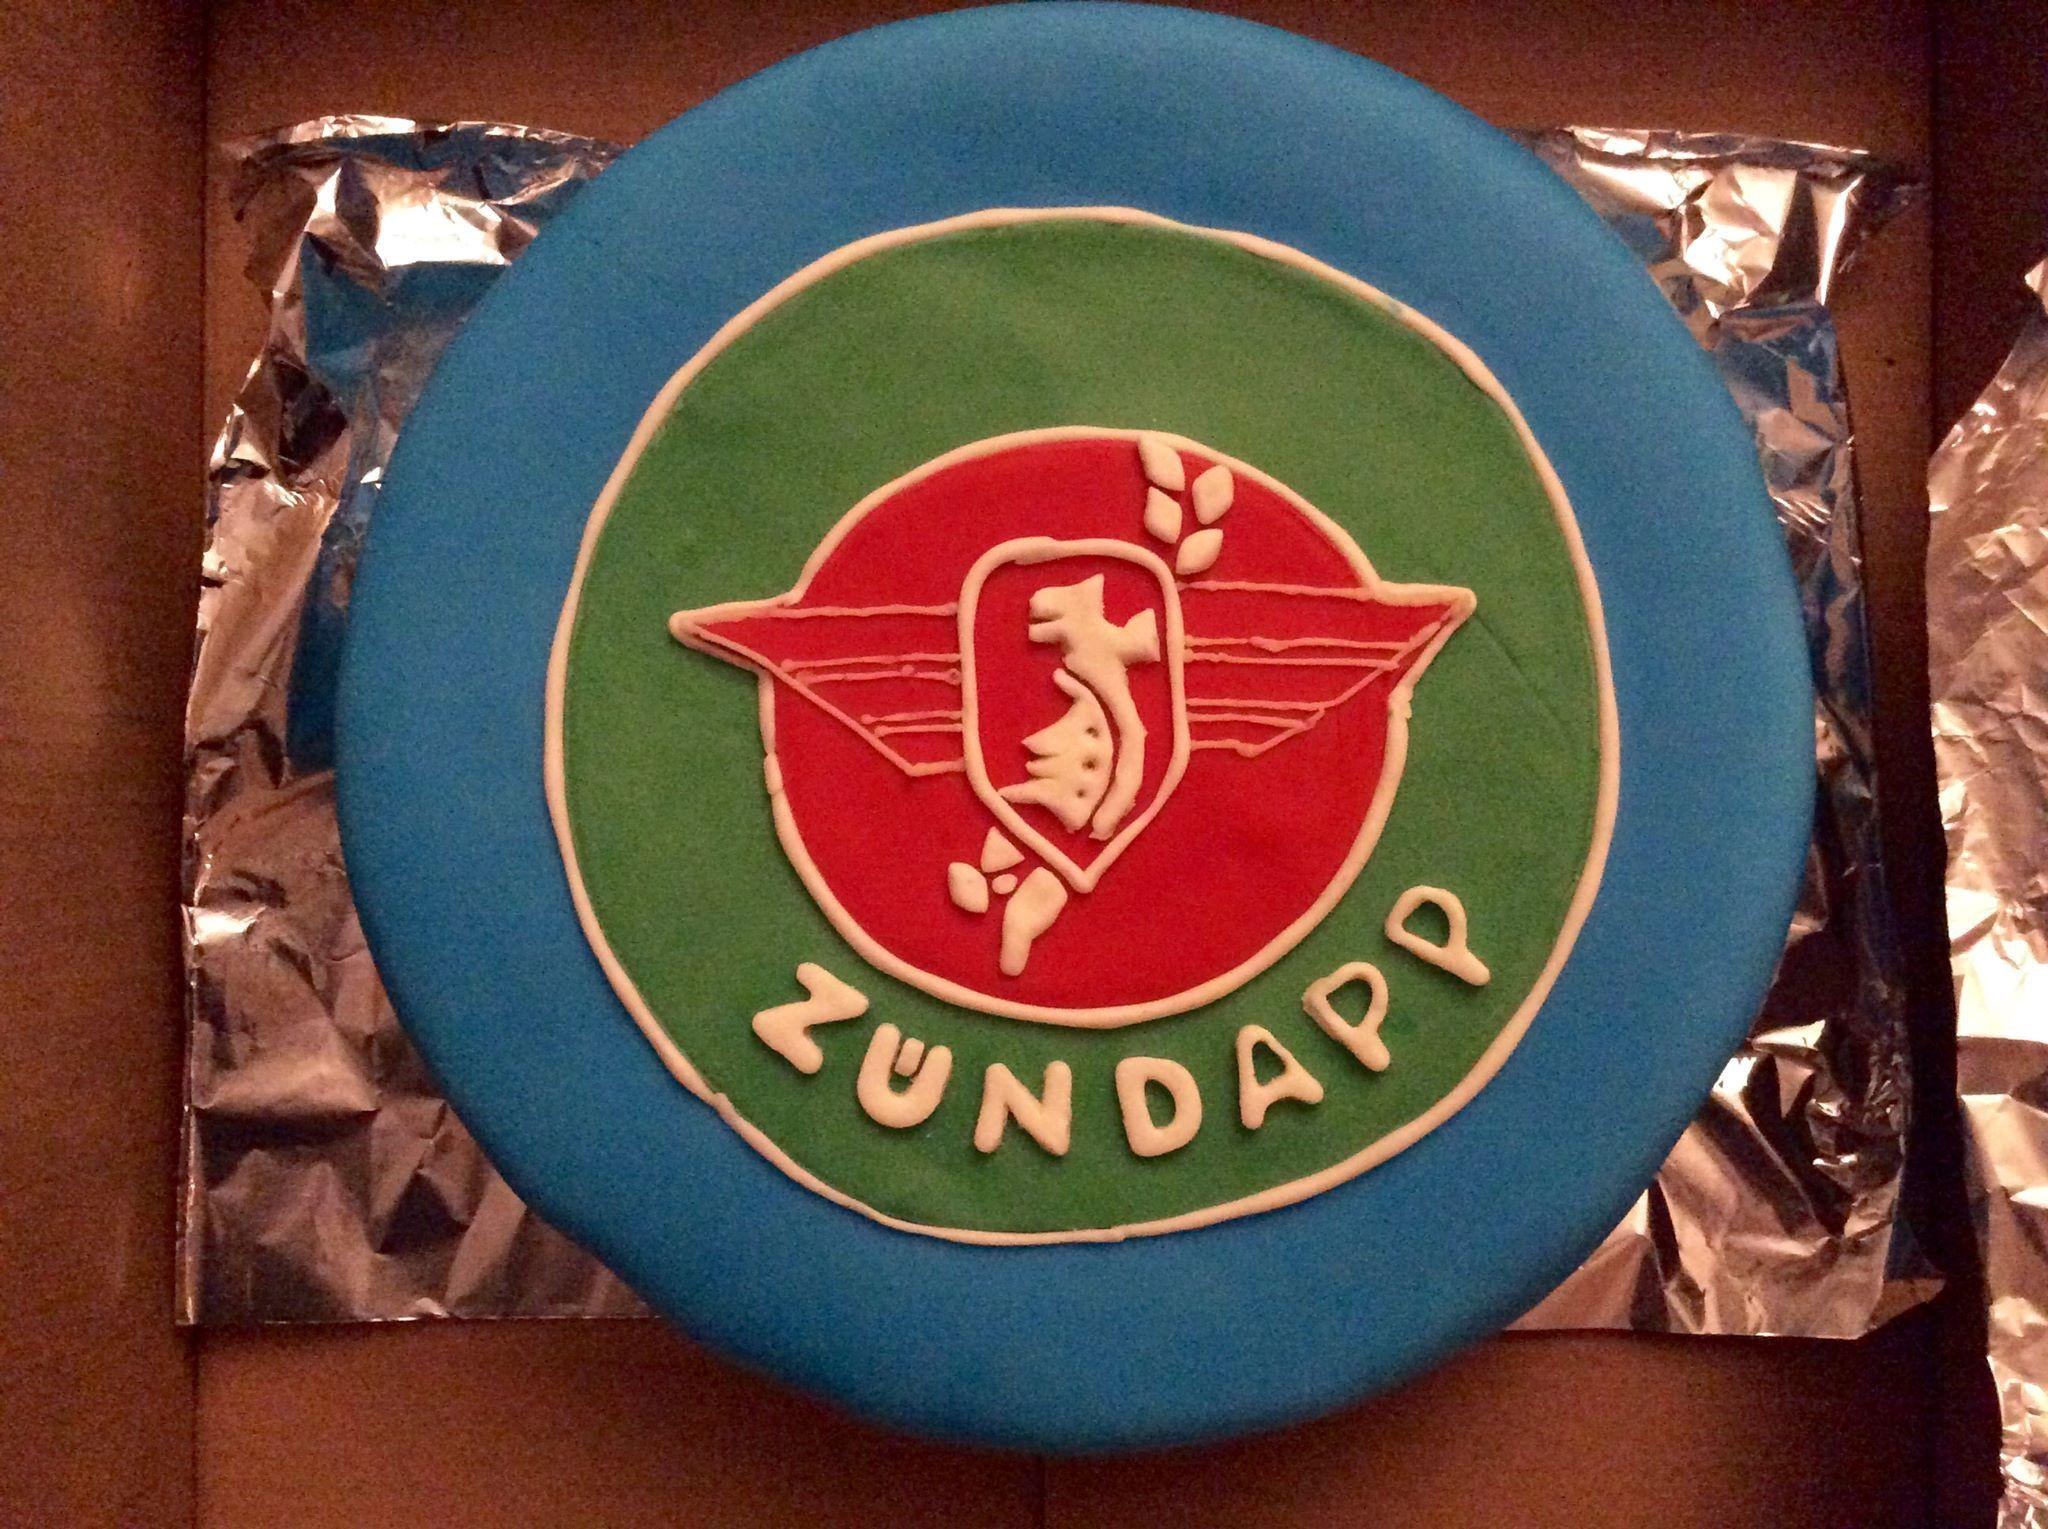 Zundapp Cake